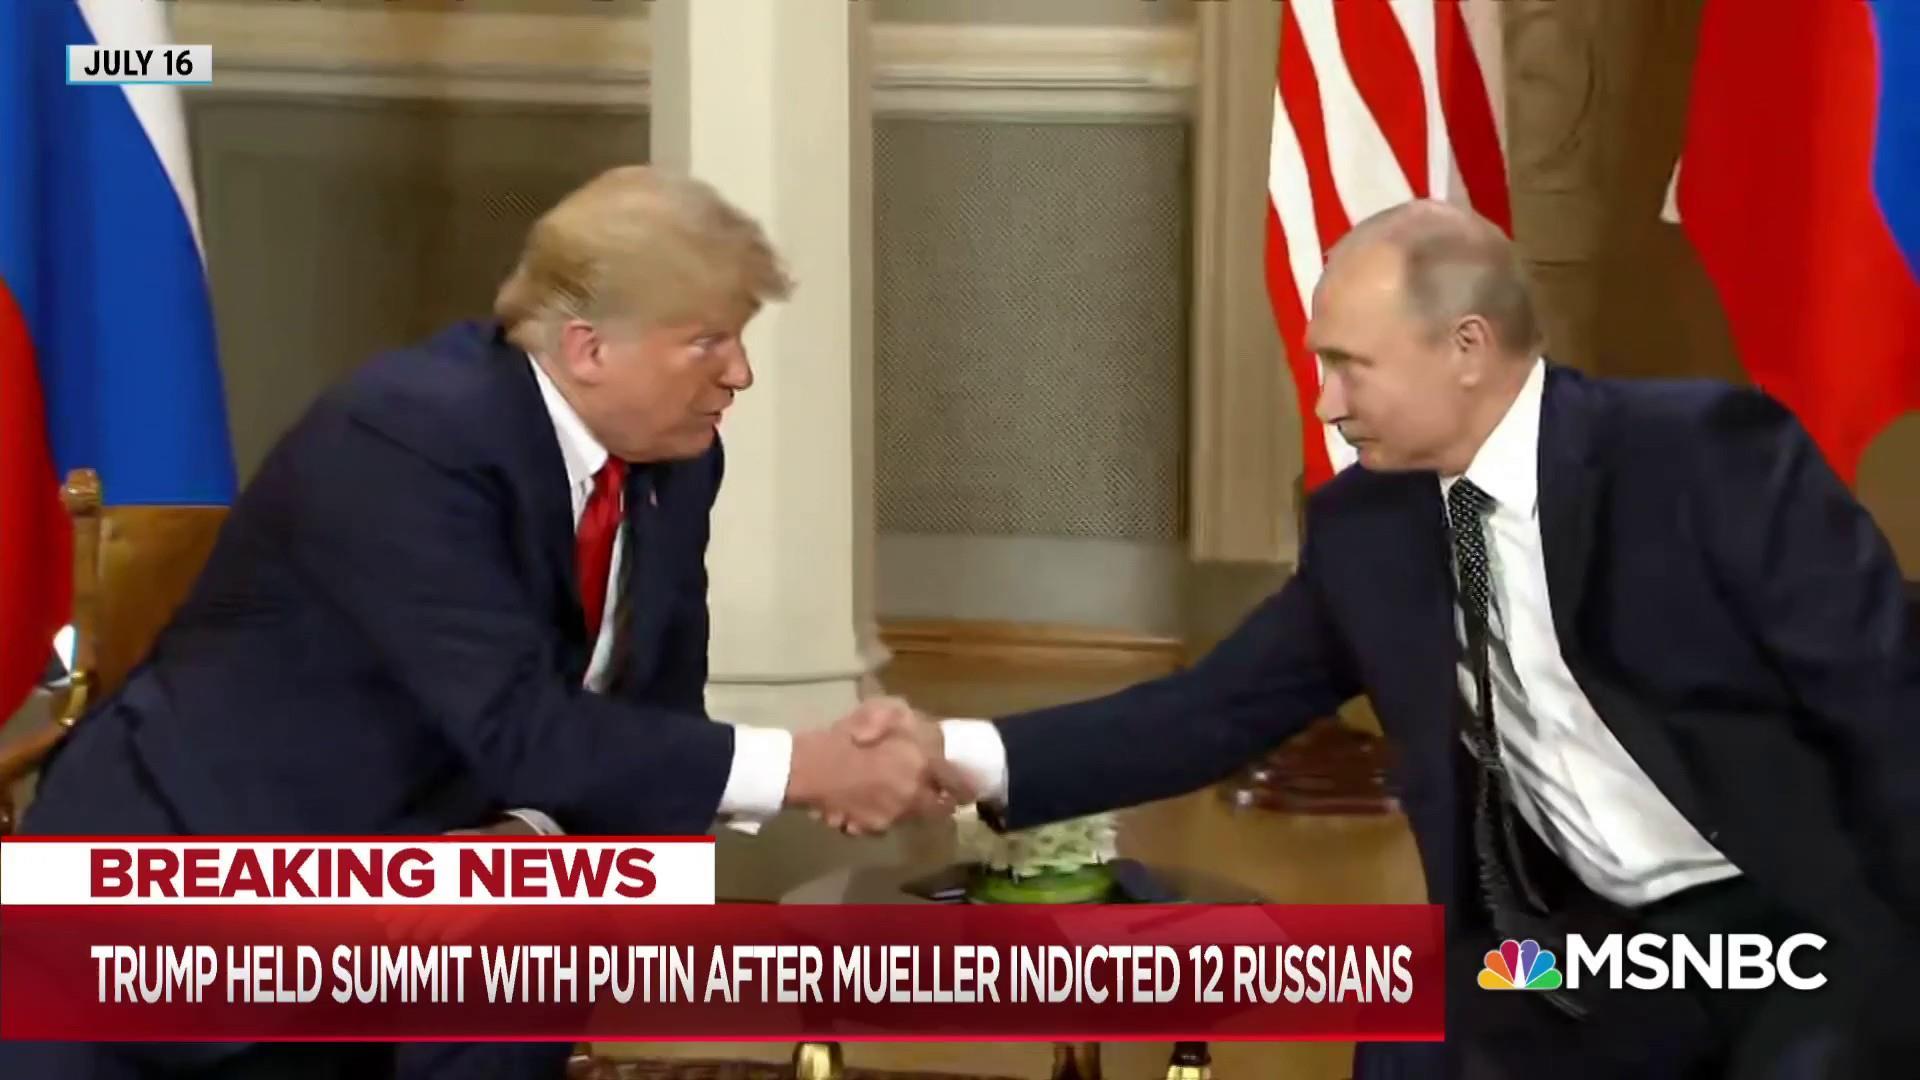 Mueller actions overshadow another planned Trump-Putin meeting